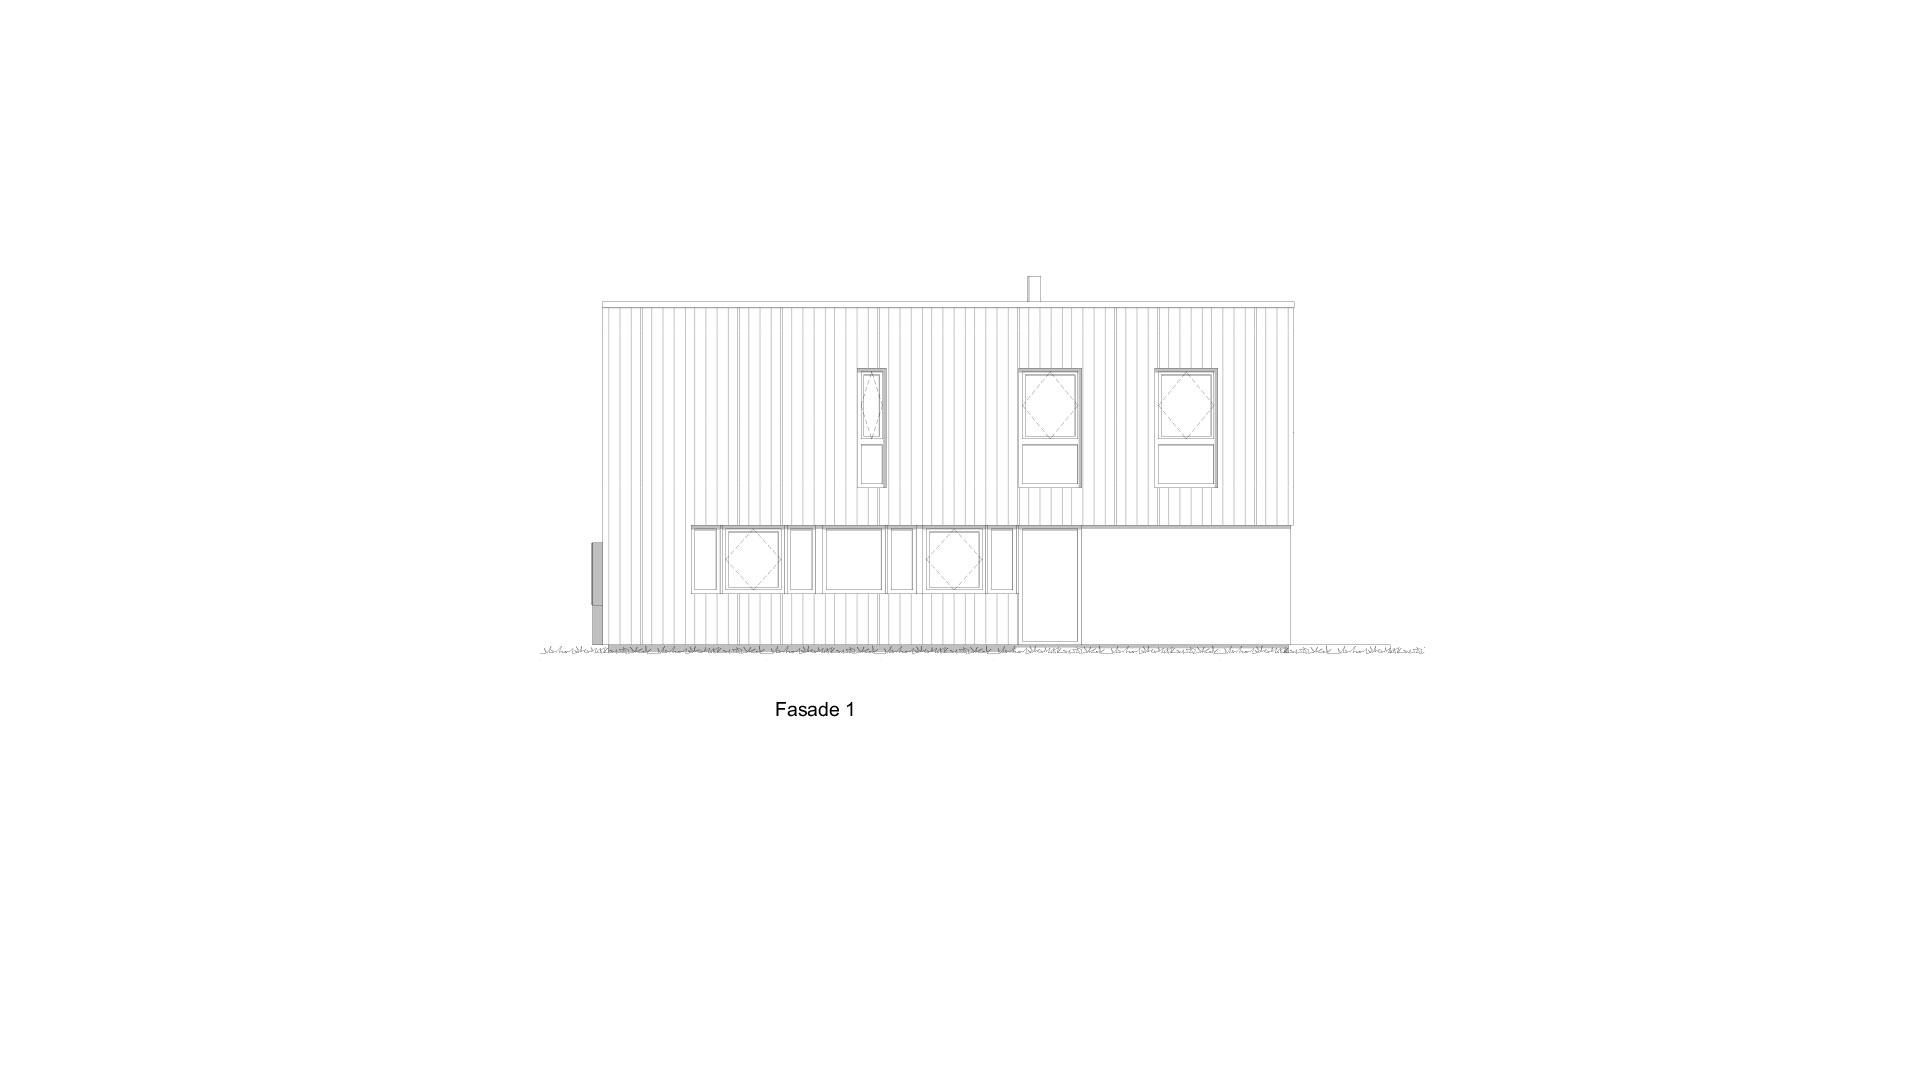 DrapenModerne_Fasade1.jpg